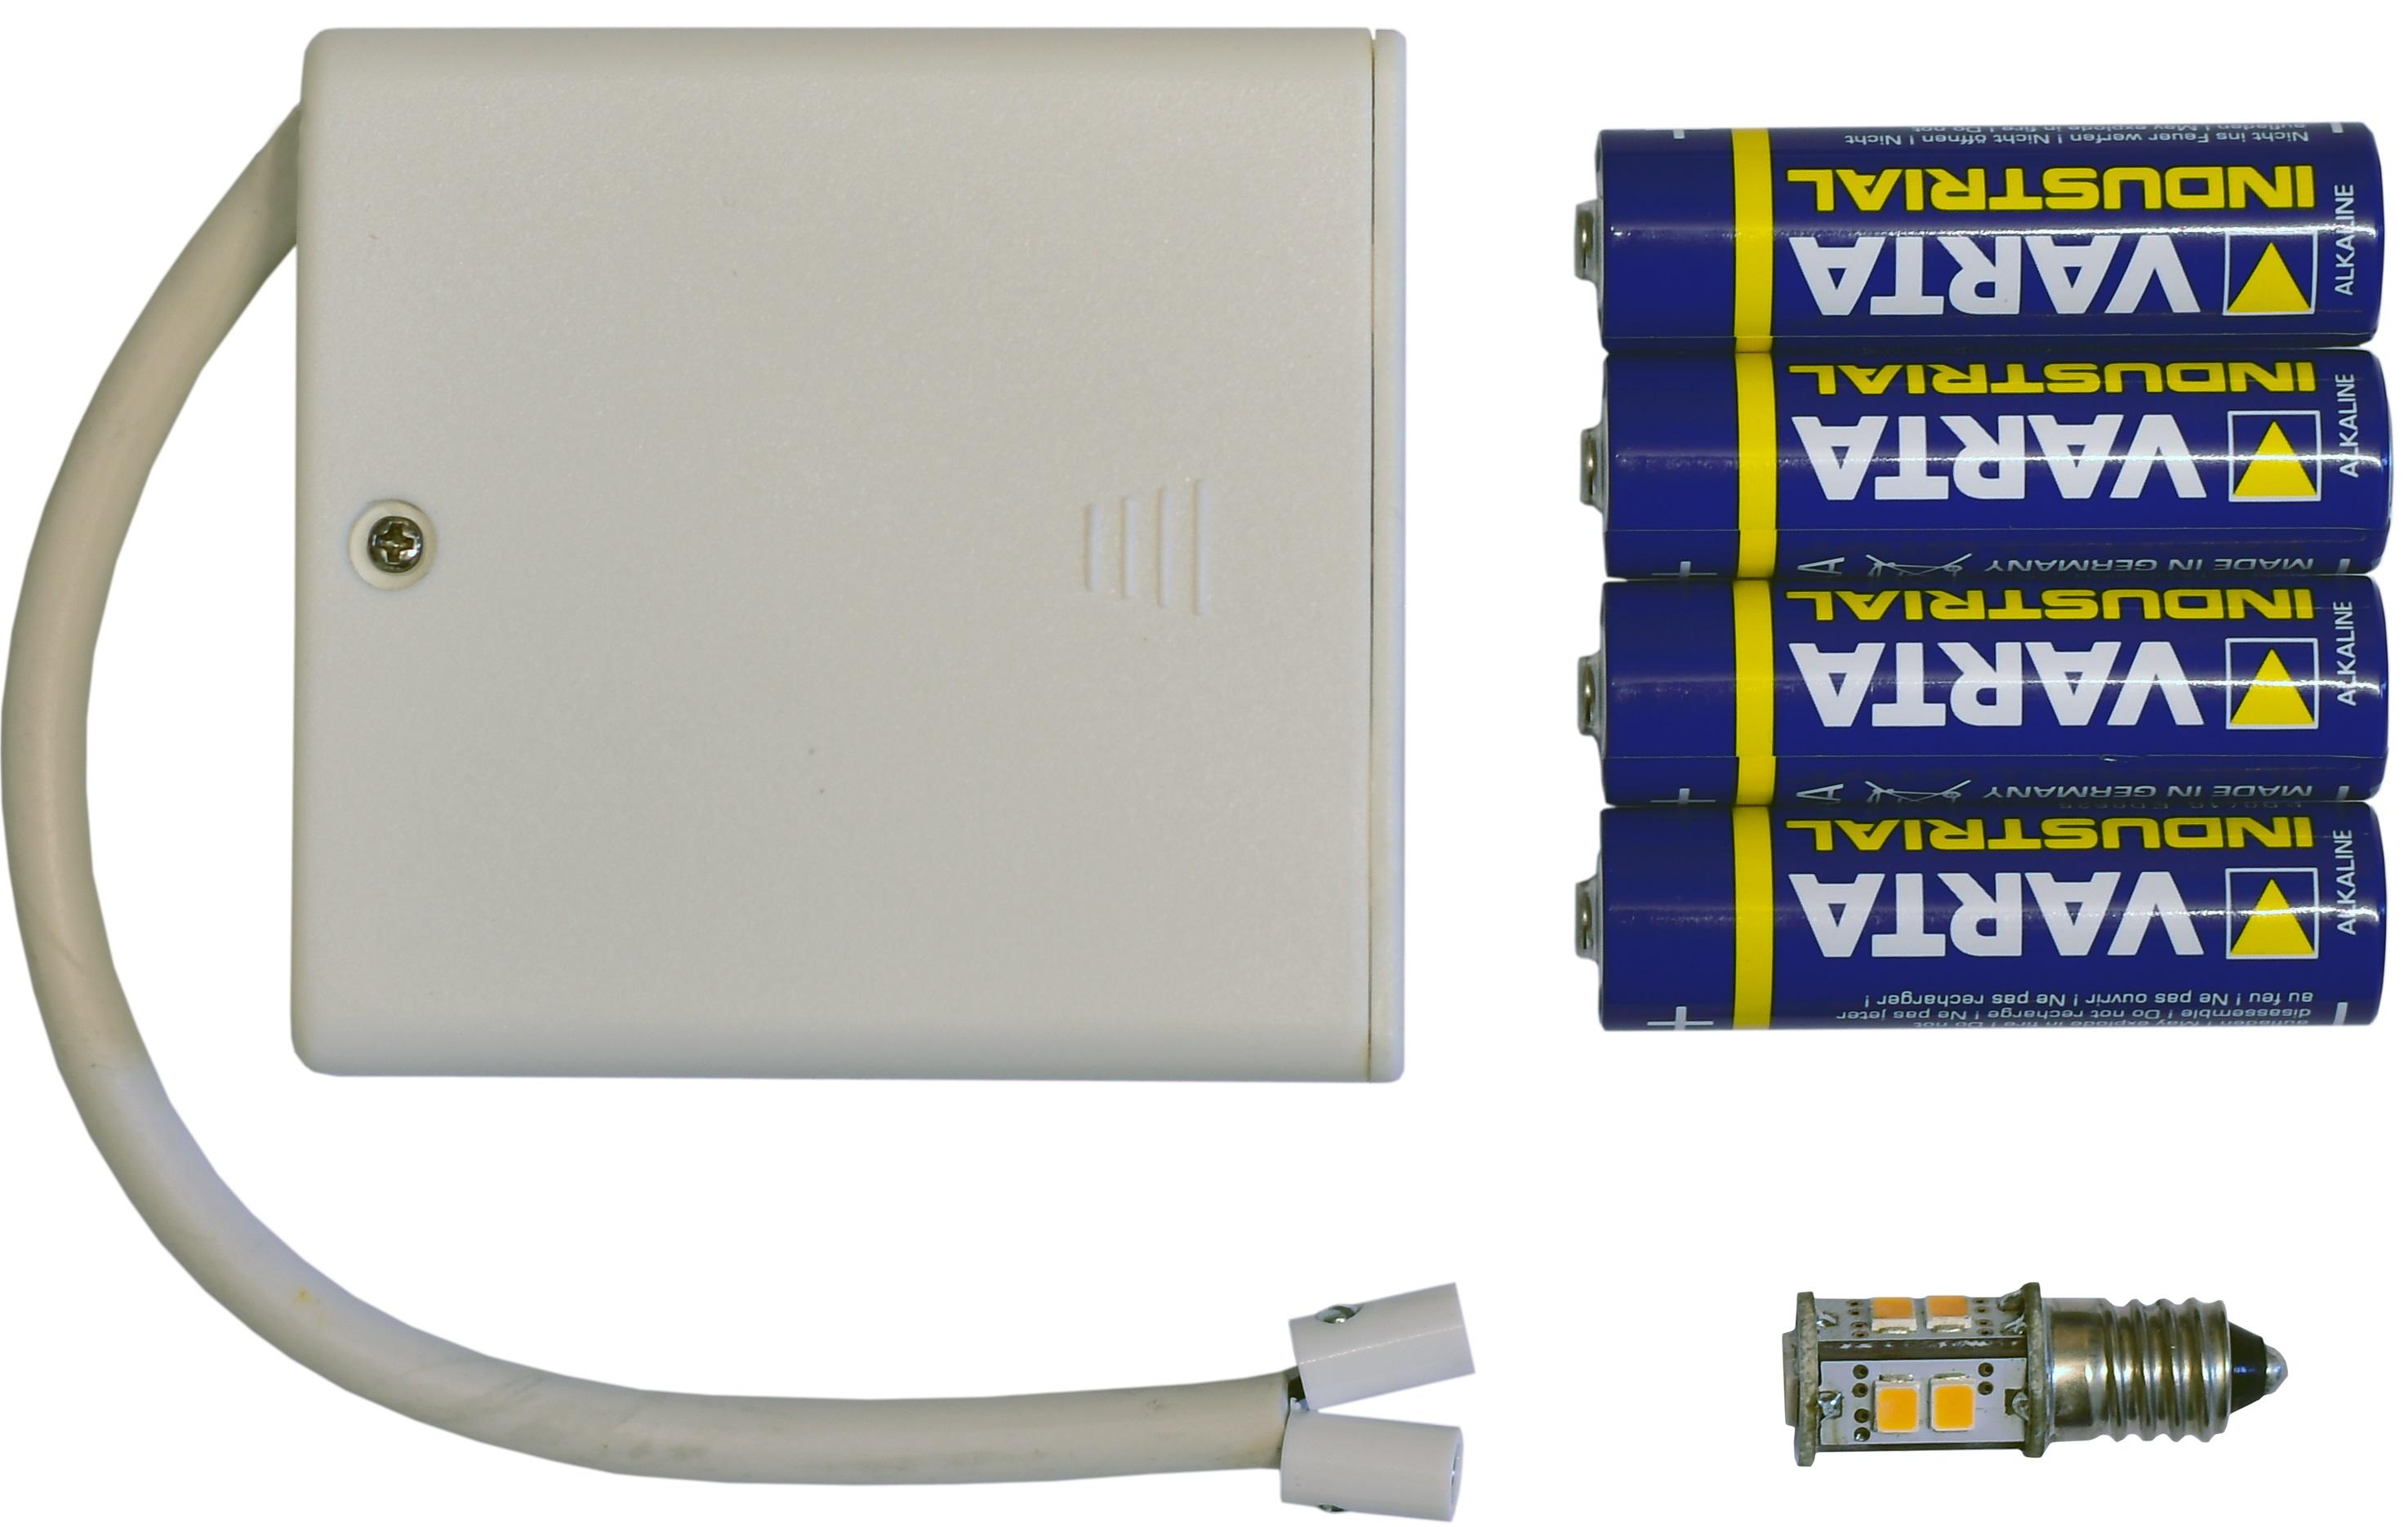 Herrnhuter Batteriehalter Zur Beleuchtung von 1 Stern (A1e,A1b,I1)